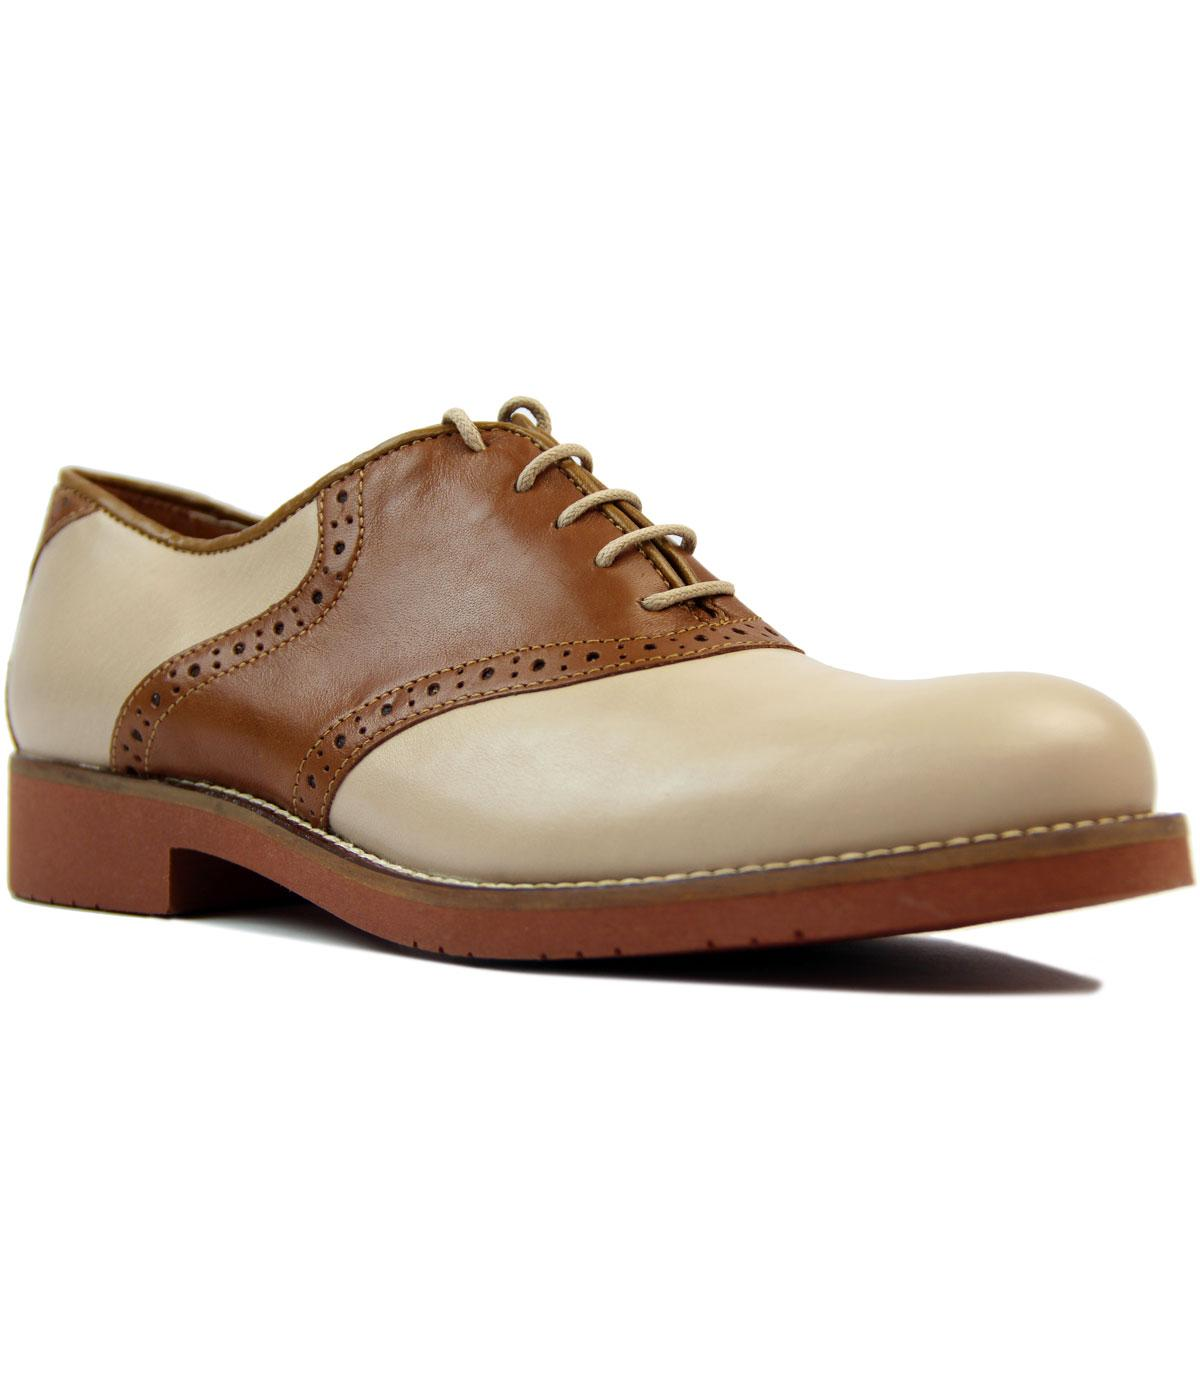 Albany BASS WEEJUNS Retro 60s 2 Tone Saddle Shoes